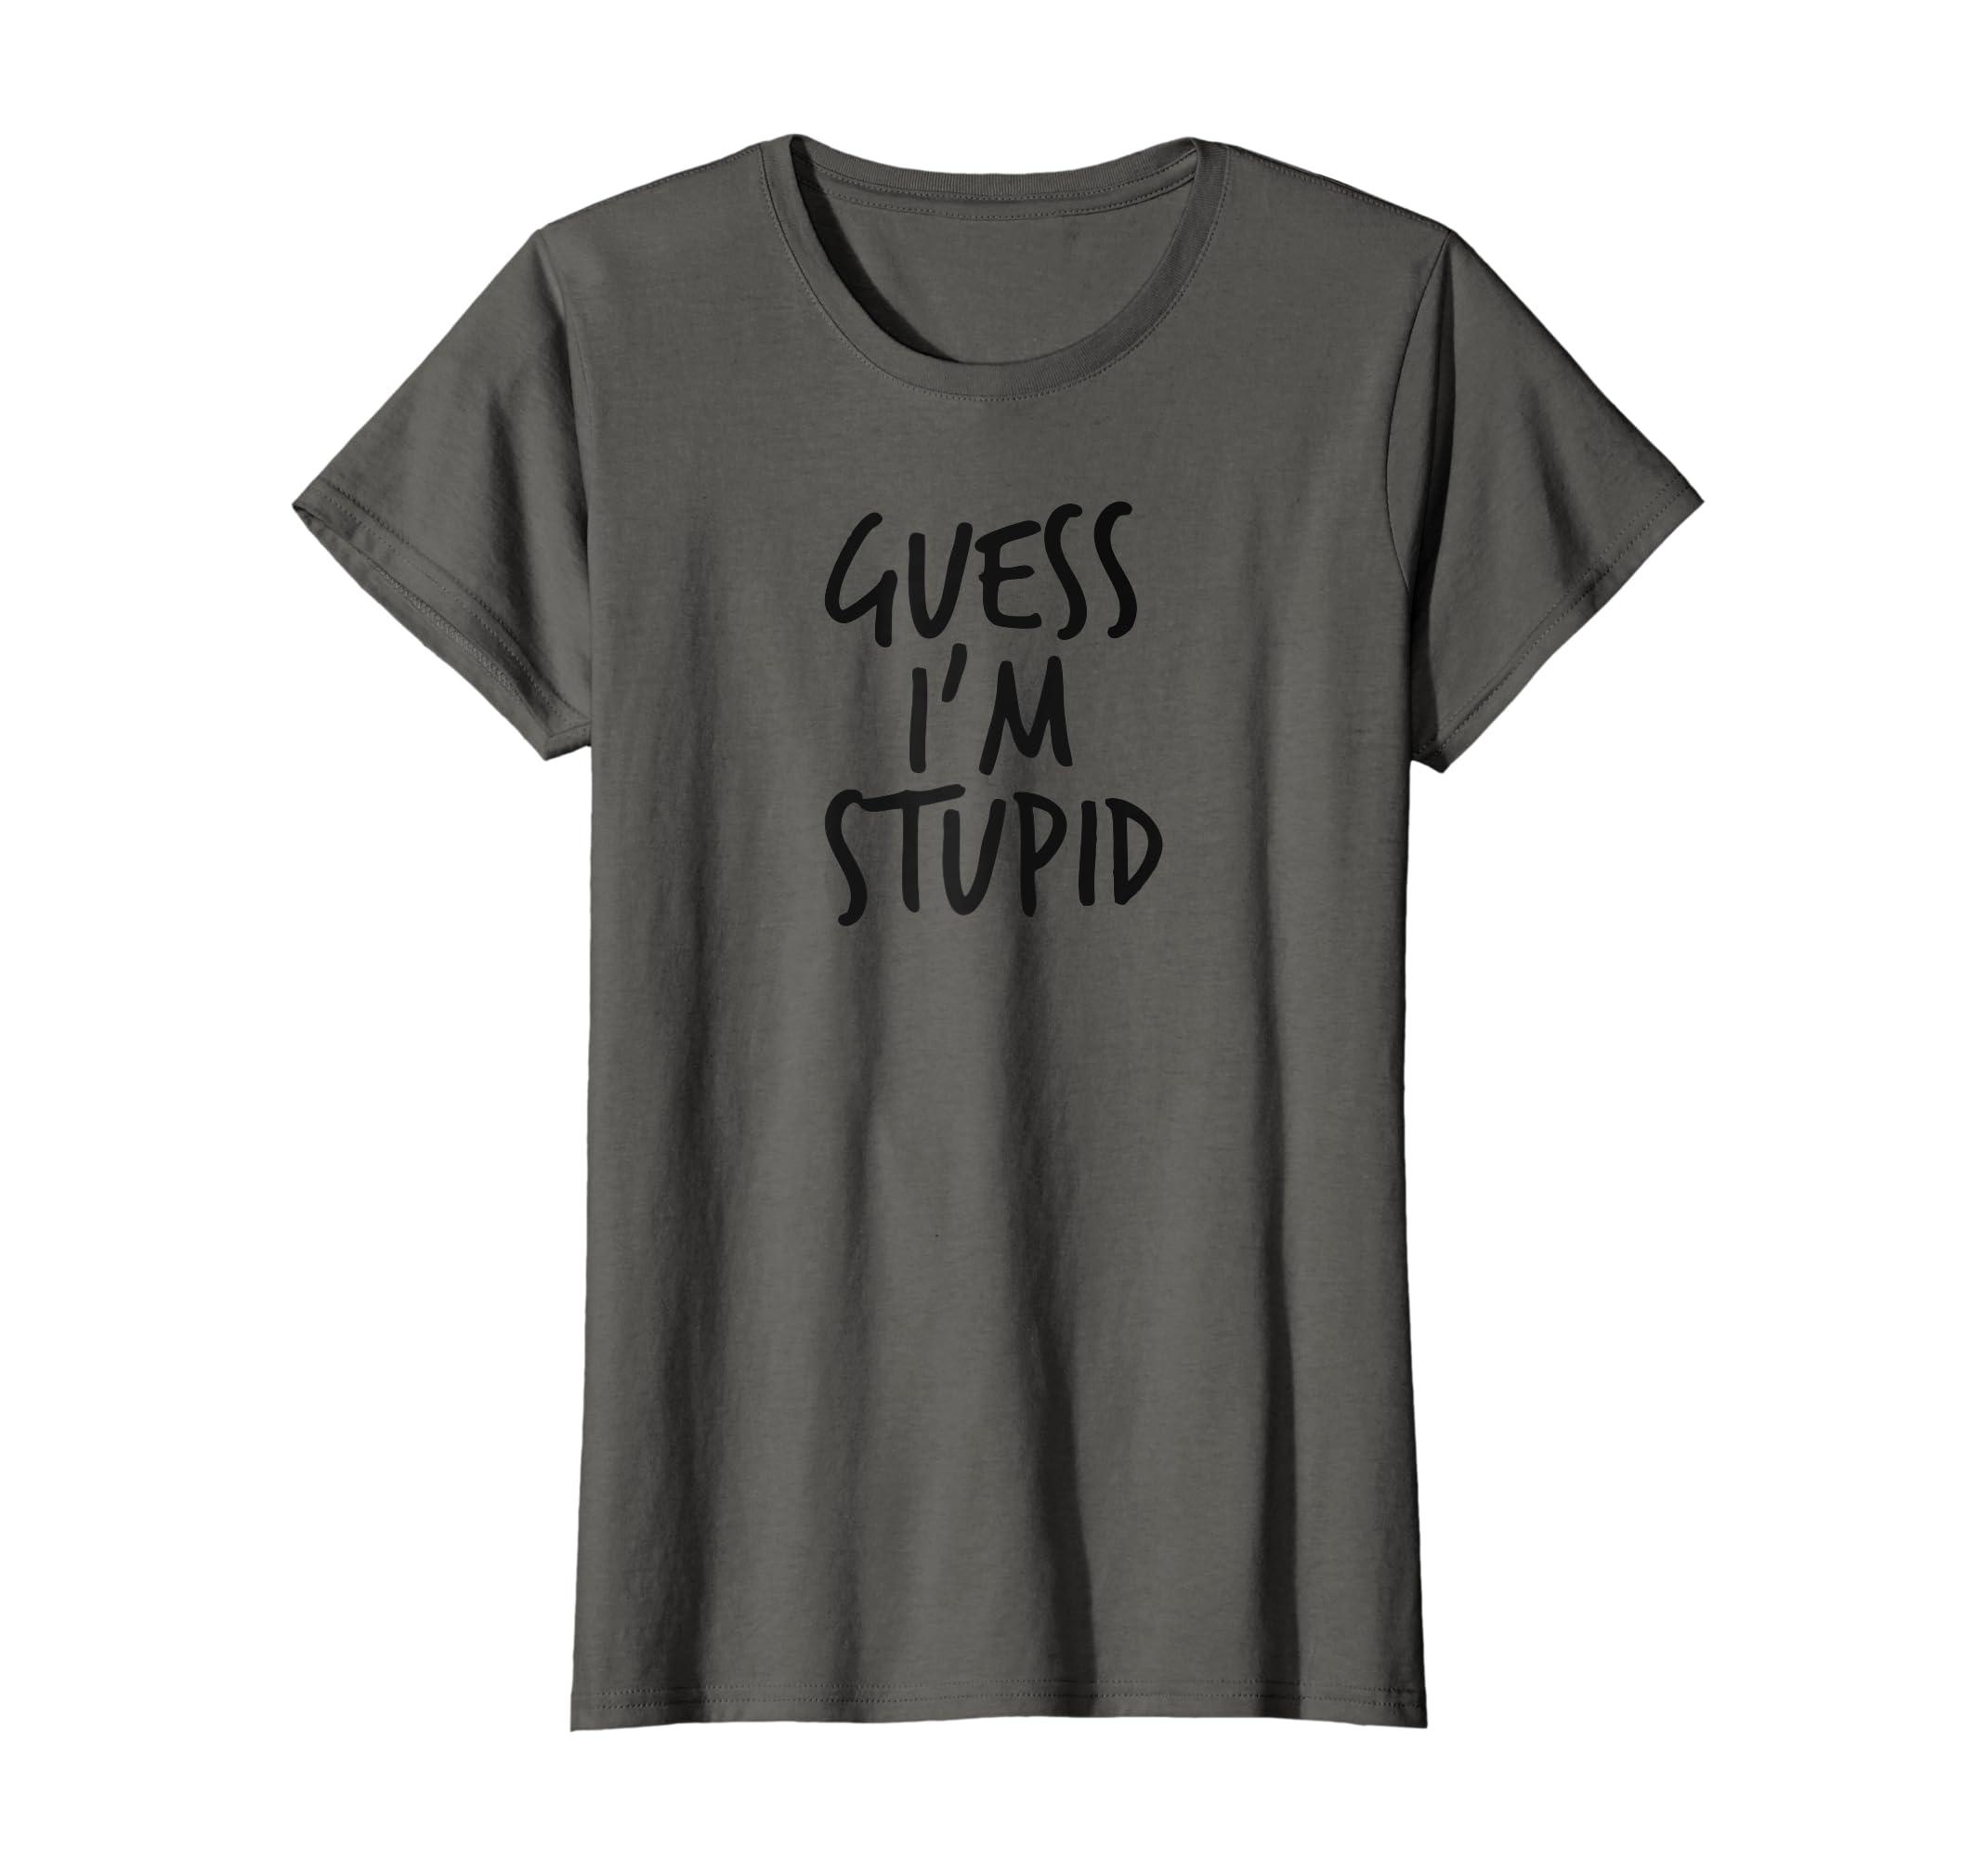 Stupid T Shirts >> Amazon Com Guess I M Stupid T Shirt Im With Stupid Shirt Clothing